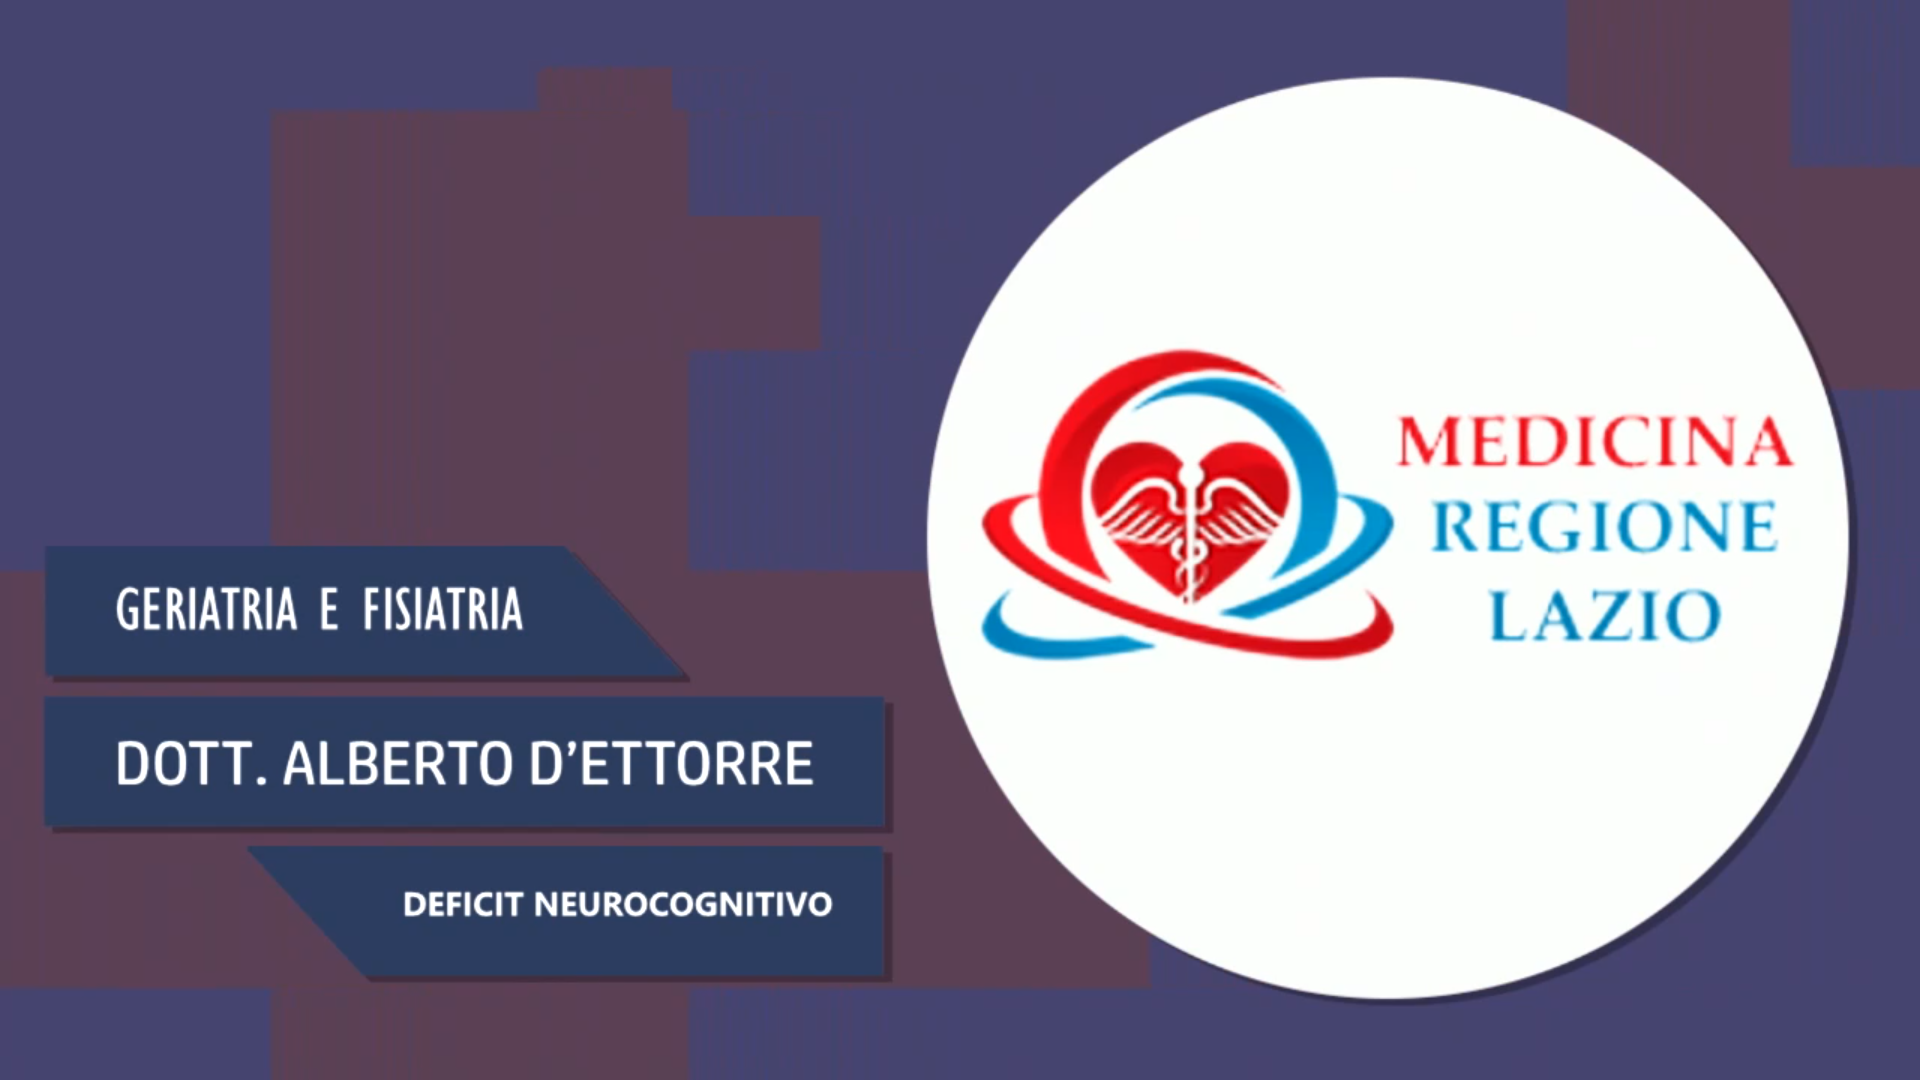 Intervista al Dott. Alberto D'Ettorre – Deficit Neurocognitivo